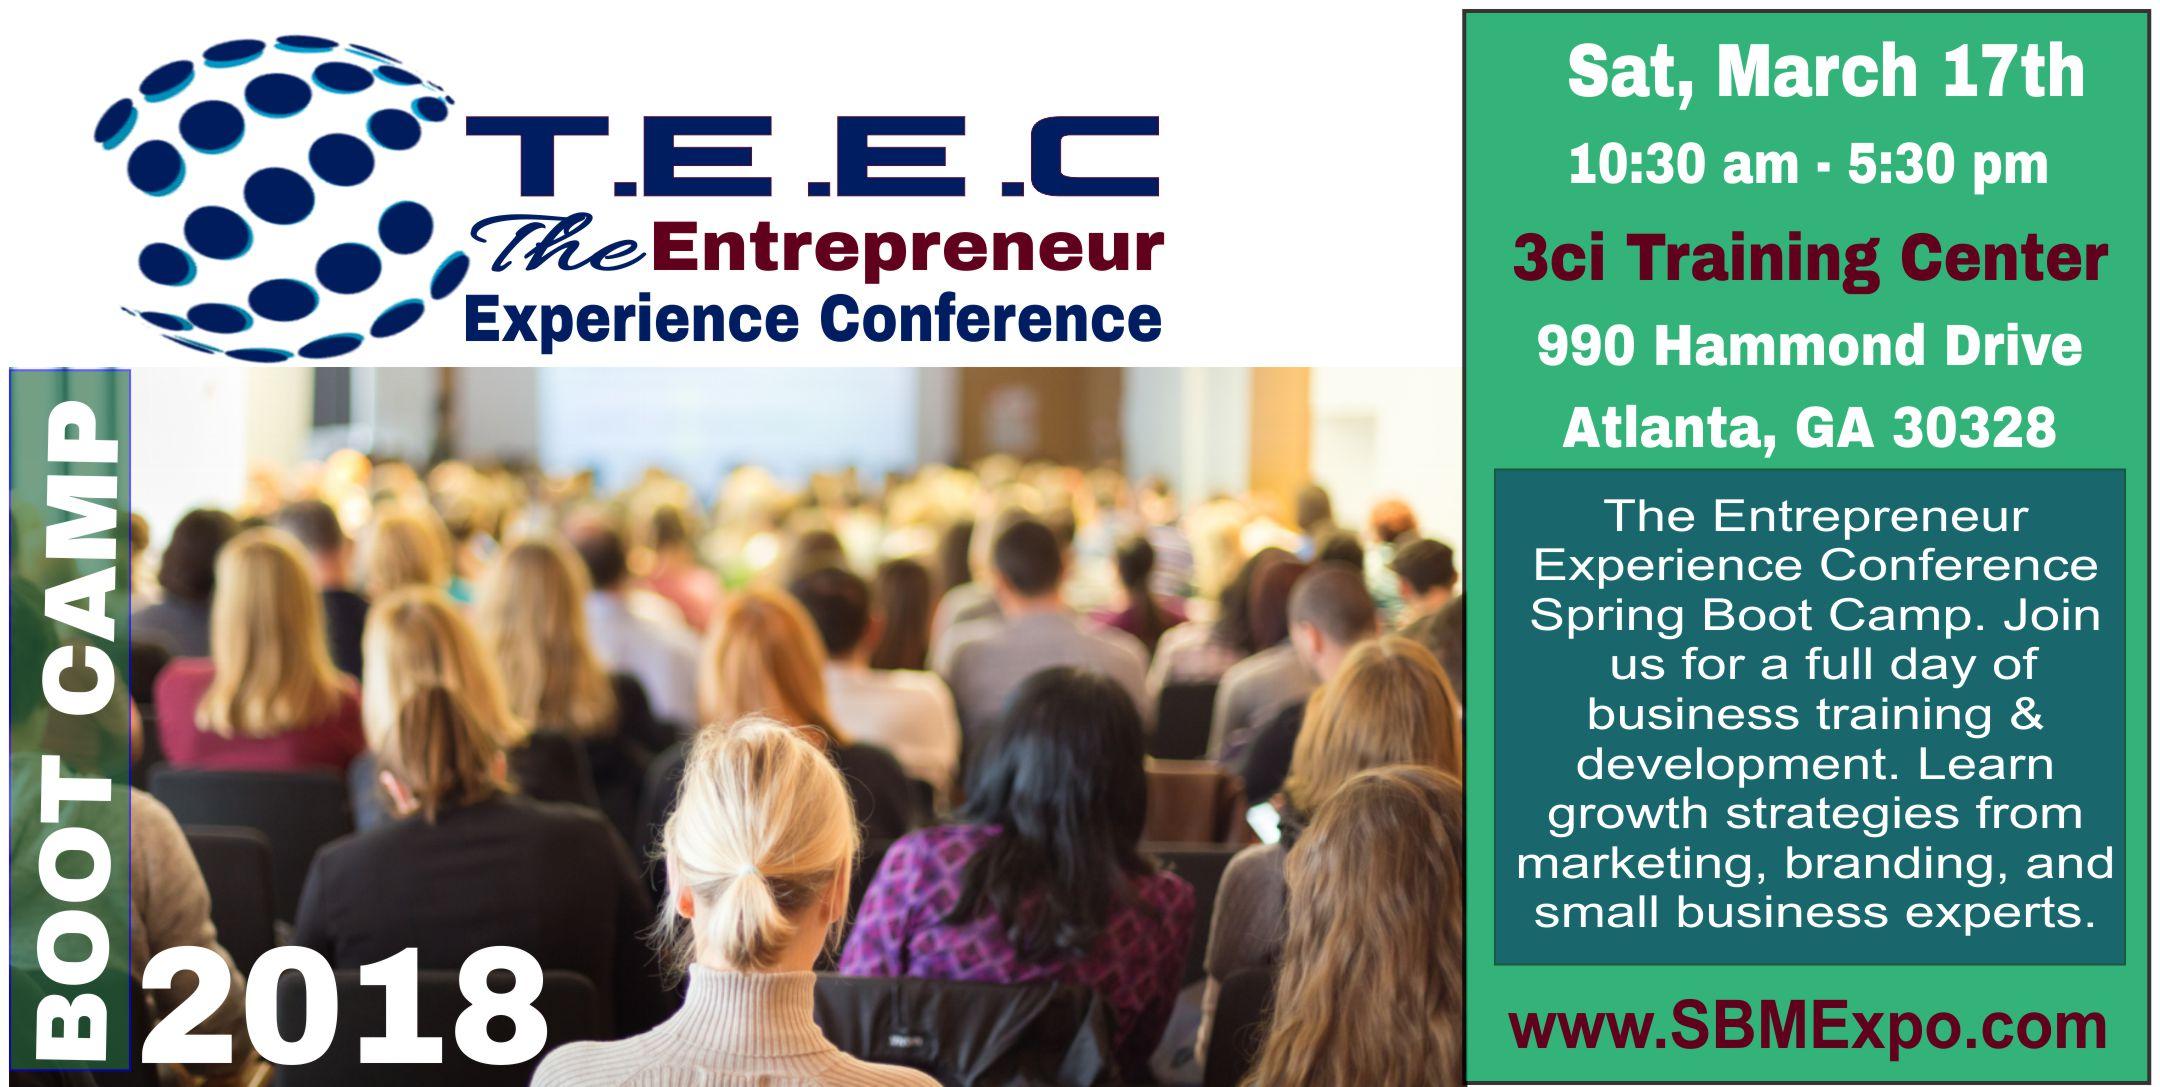 The Entrepreneur Experience Conference in Atlanta